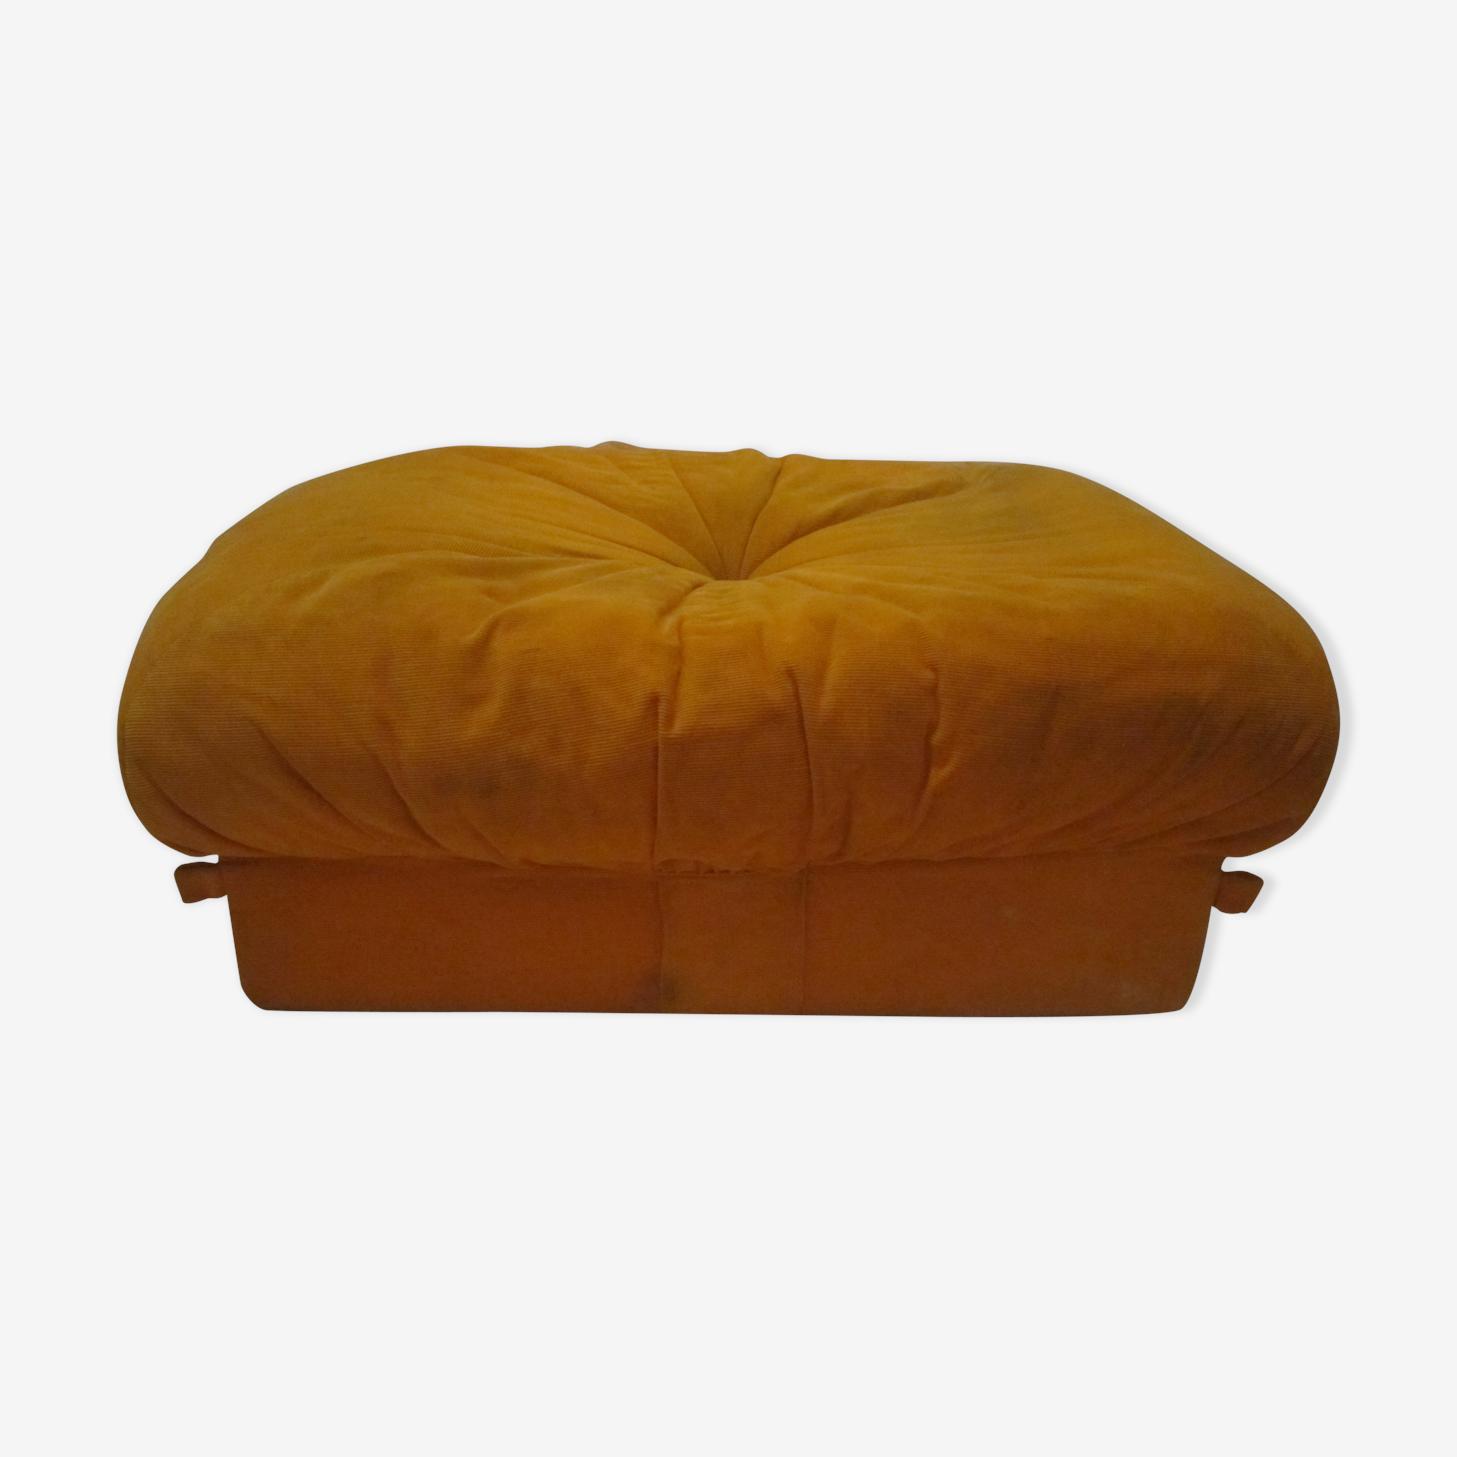 Pouf vintage orange Airborne